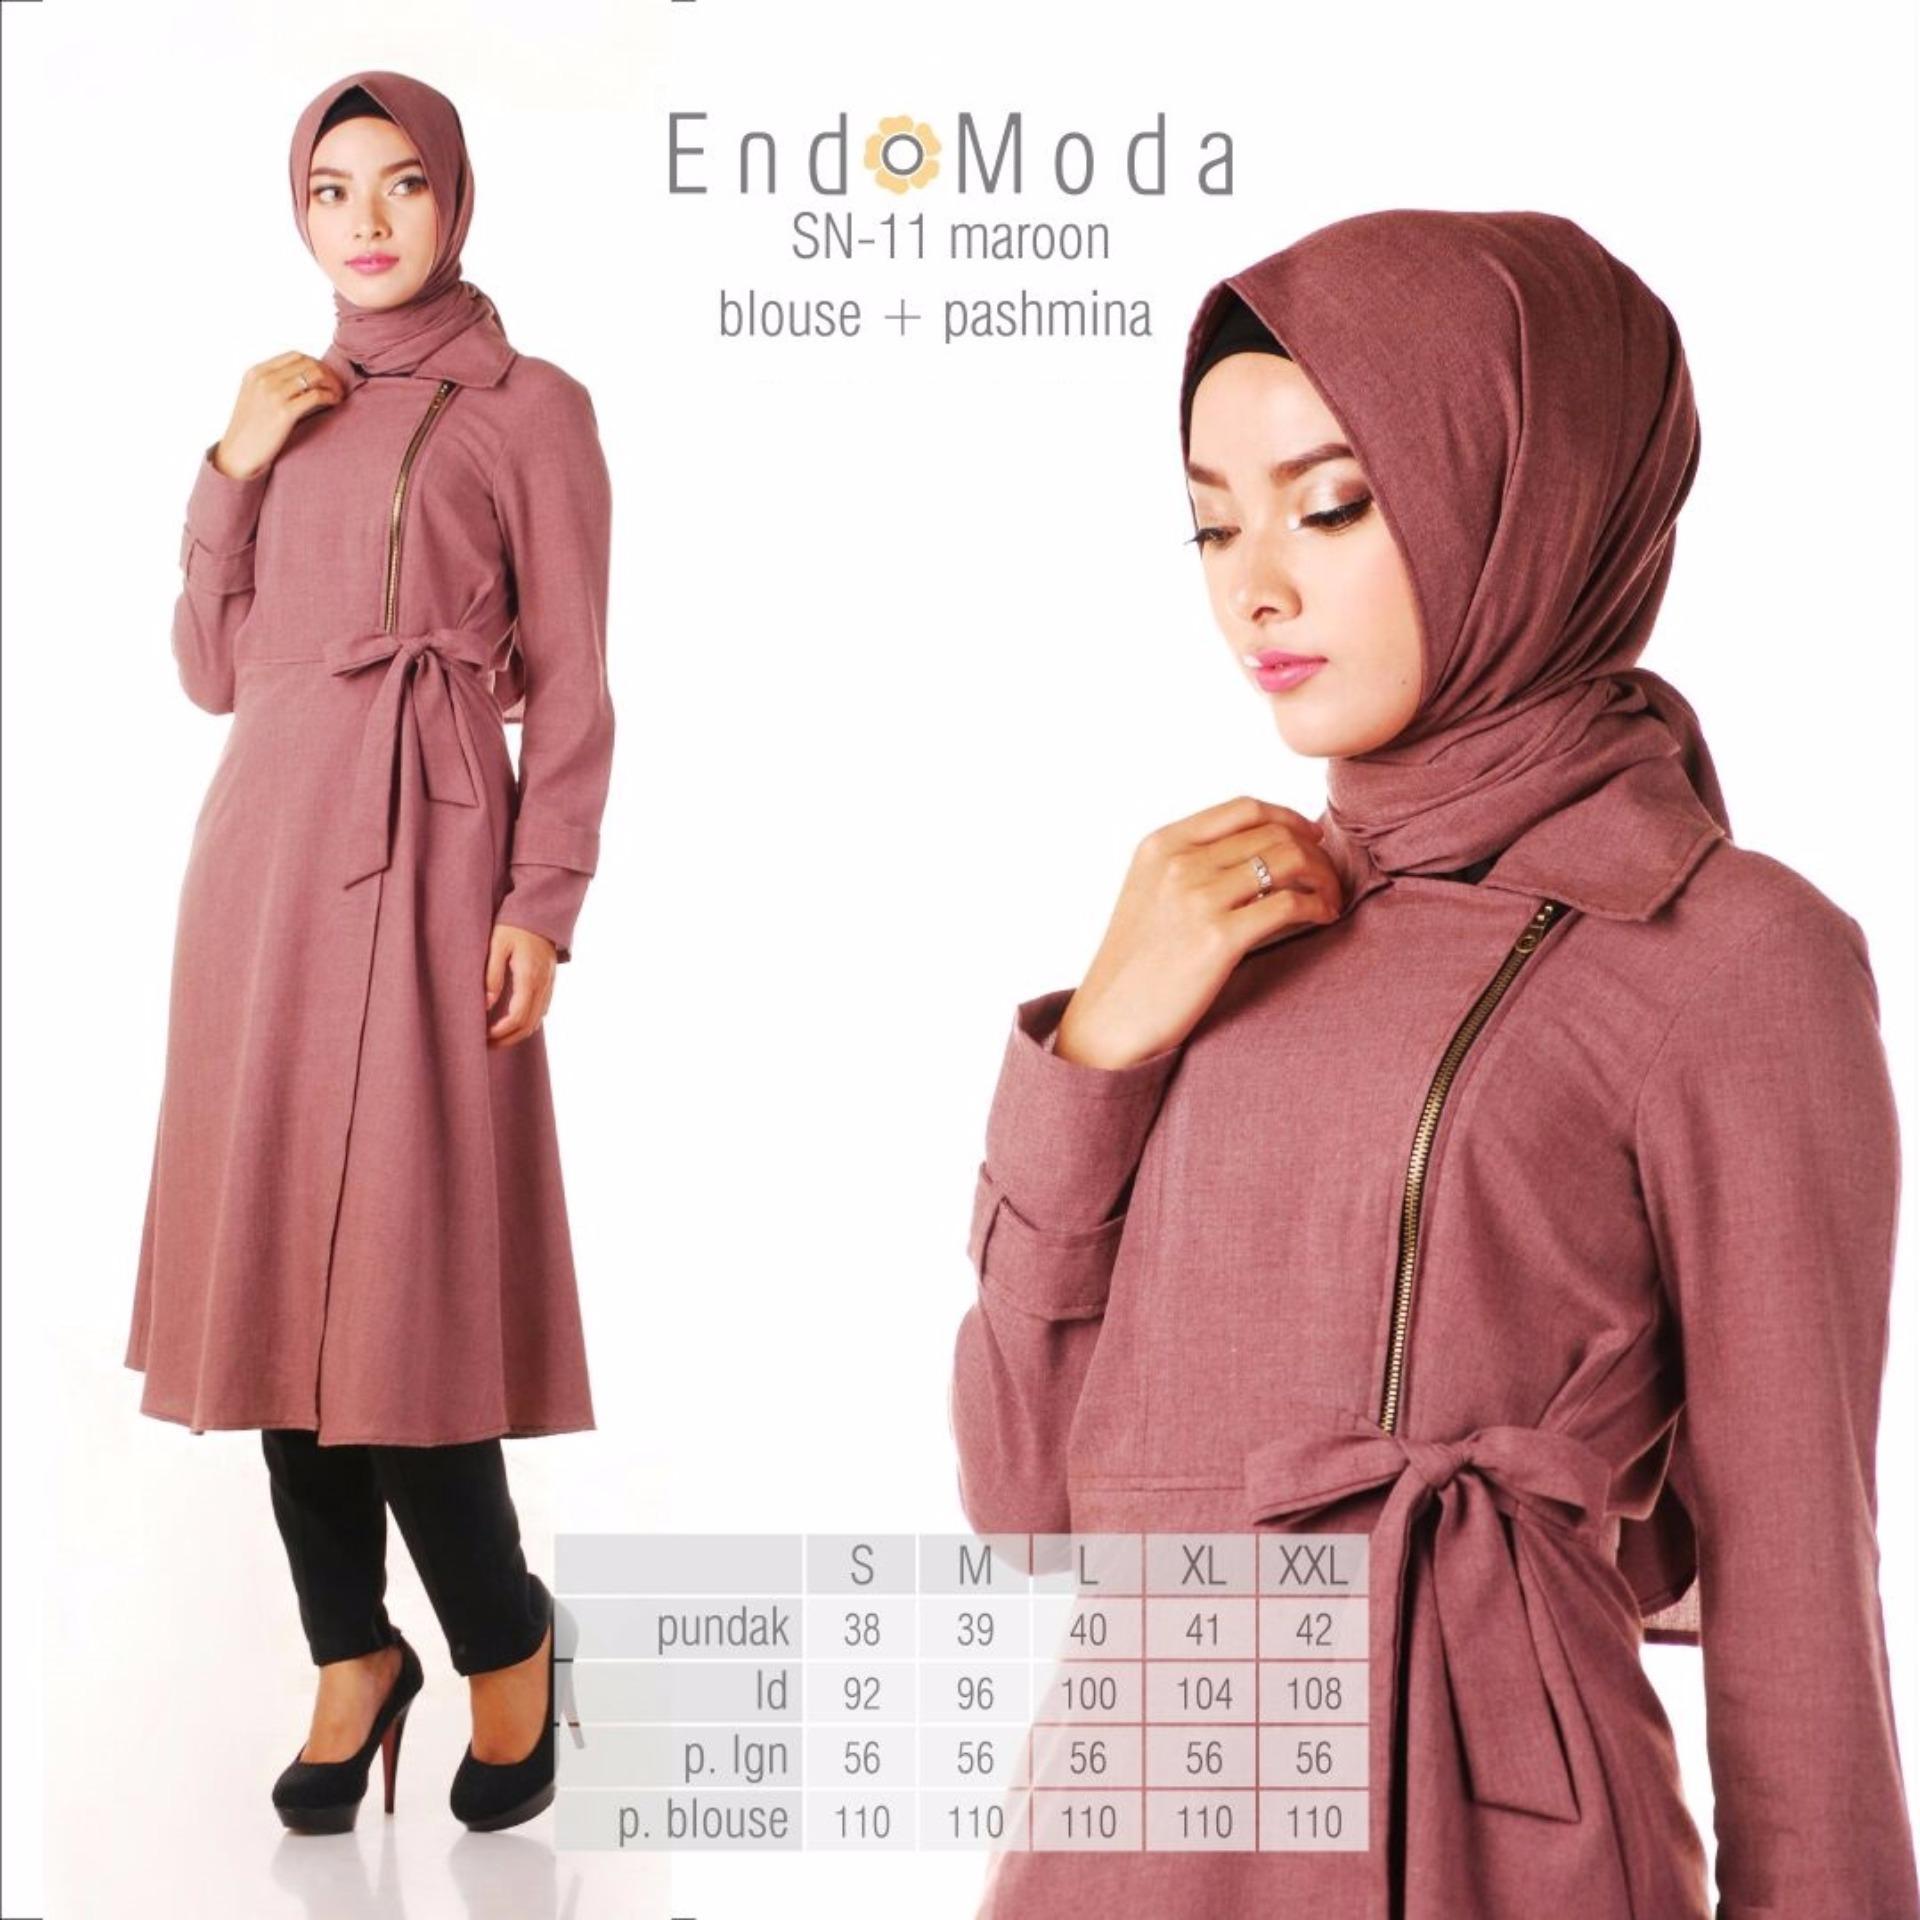 Baju Original Endo Moda Blouse Atasan SN-11 Kaos Wanita Baju Muslim Tunik Kemeja Kaos Maroon